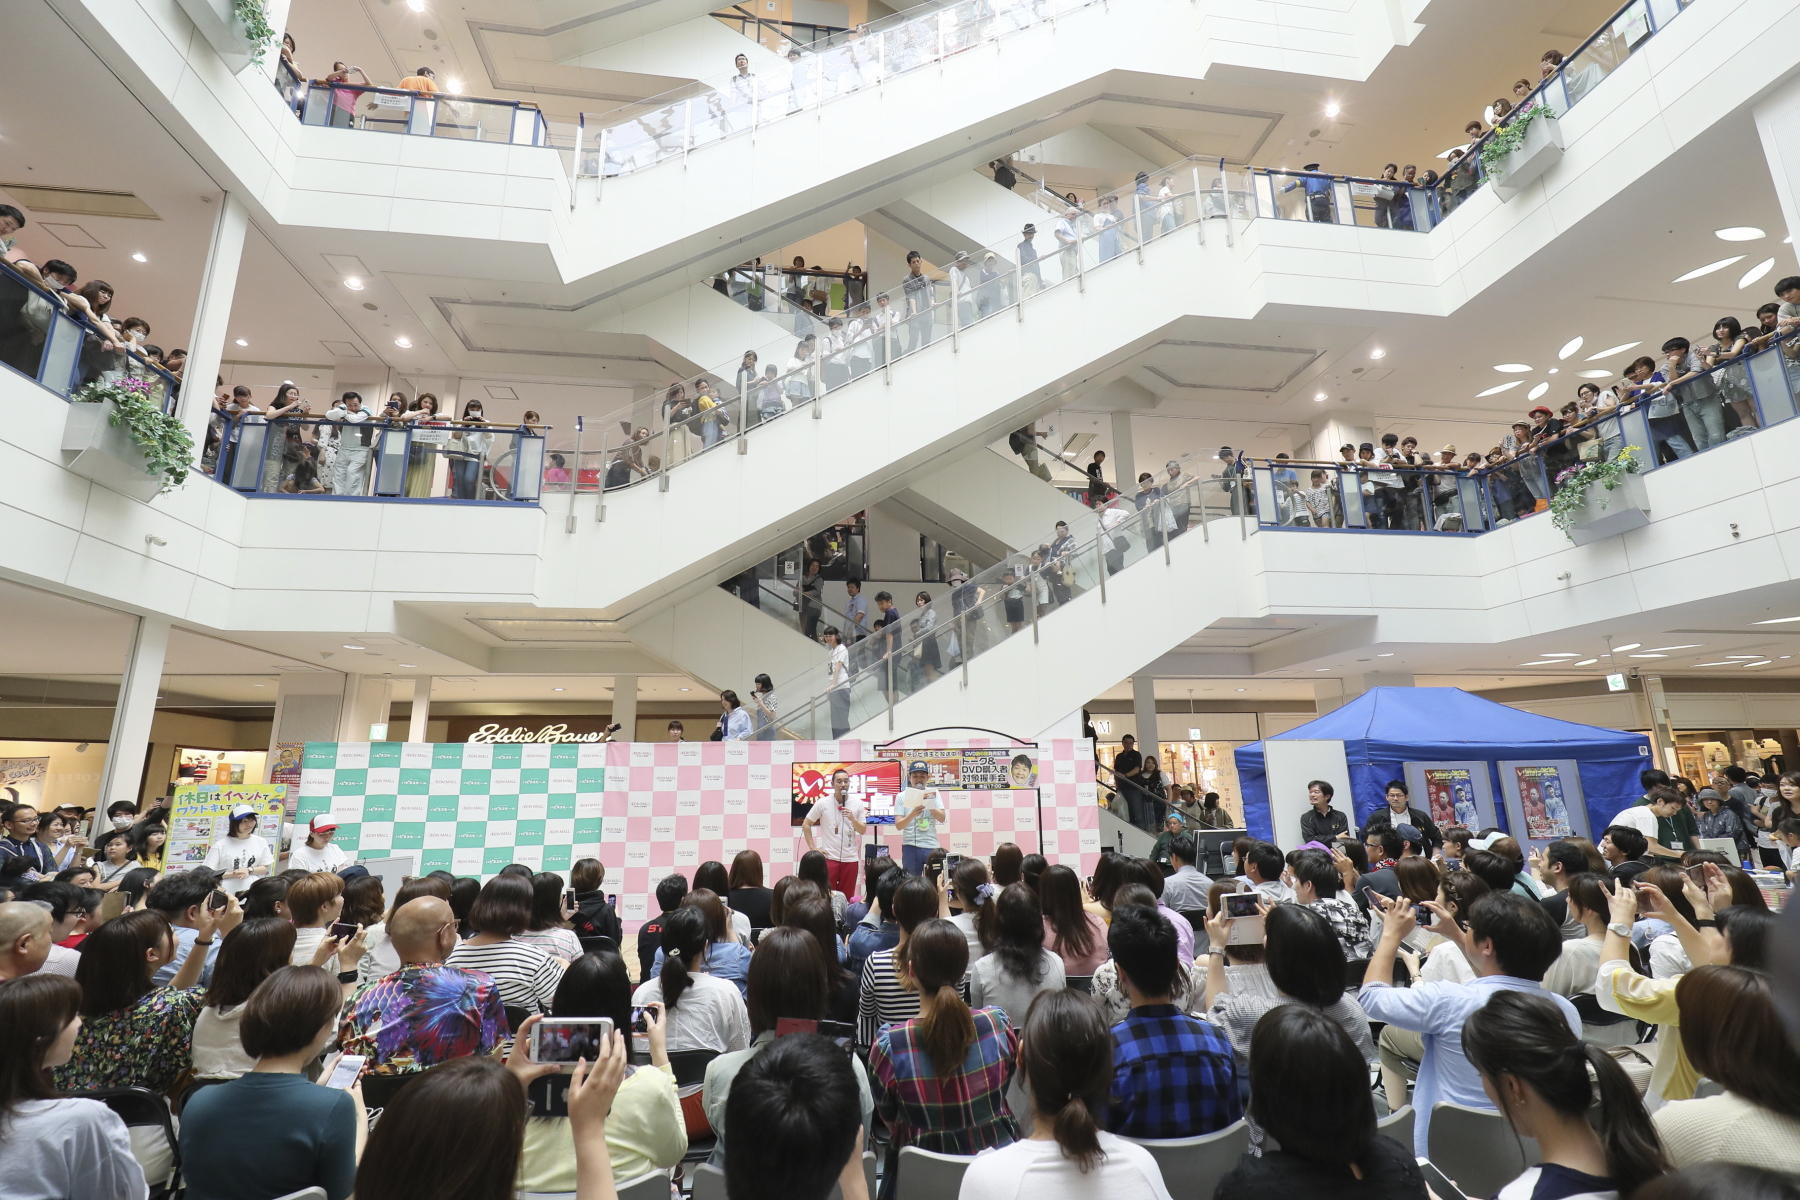 http://news.yoshimoto.co.jp/20180531130058-f1f4c38d5cd361ff12462b51bb5ad9af4ea33ab2.jpg